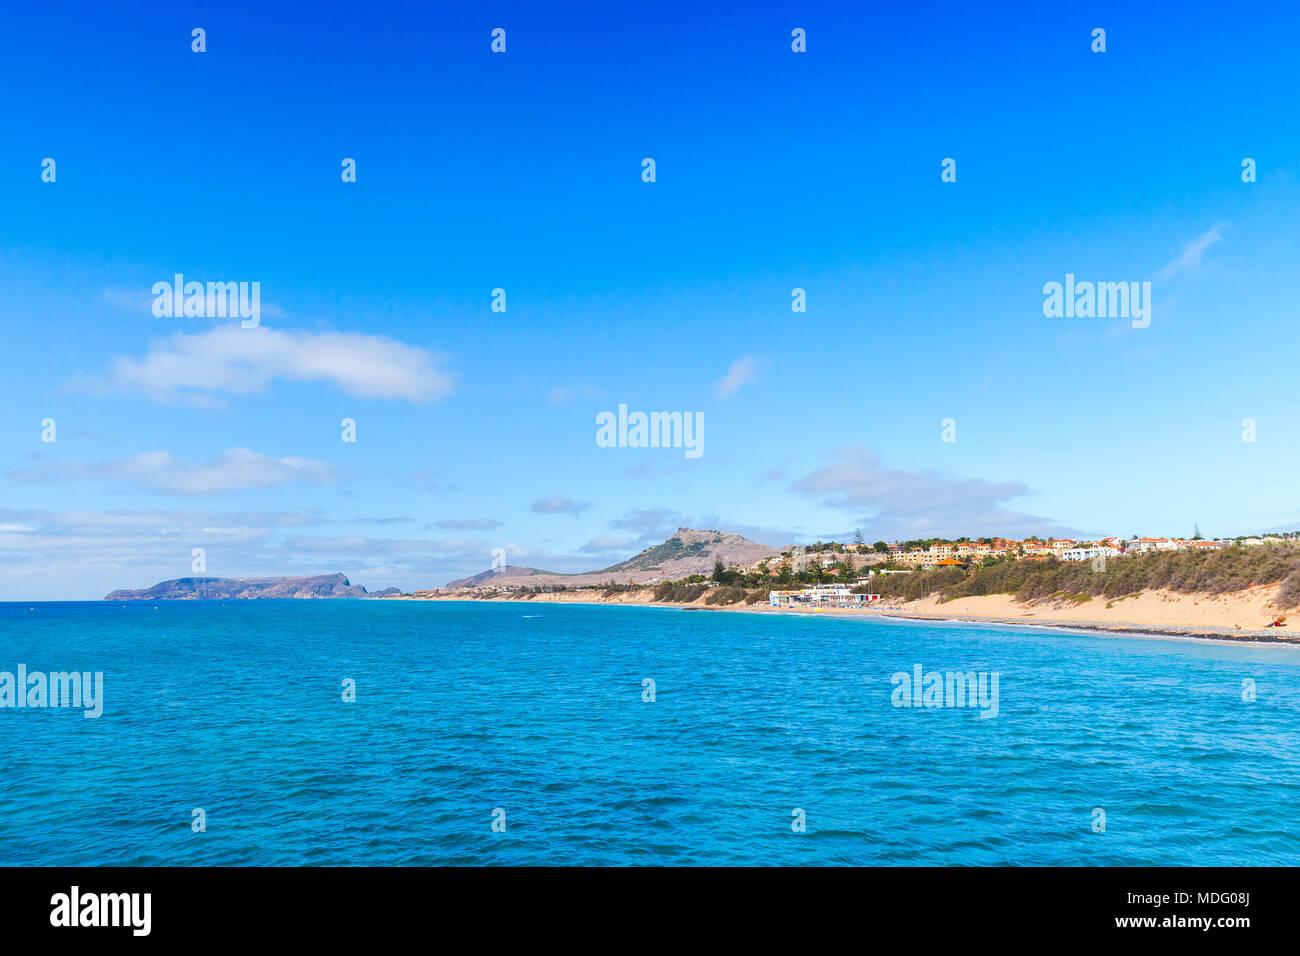 Coastal landscape of Porto Santo island in Madeira archipelago, Portugal - Stock Image